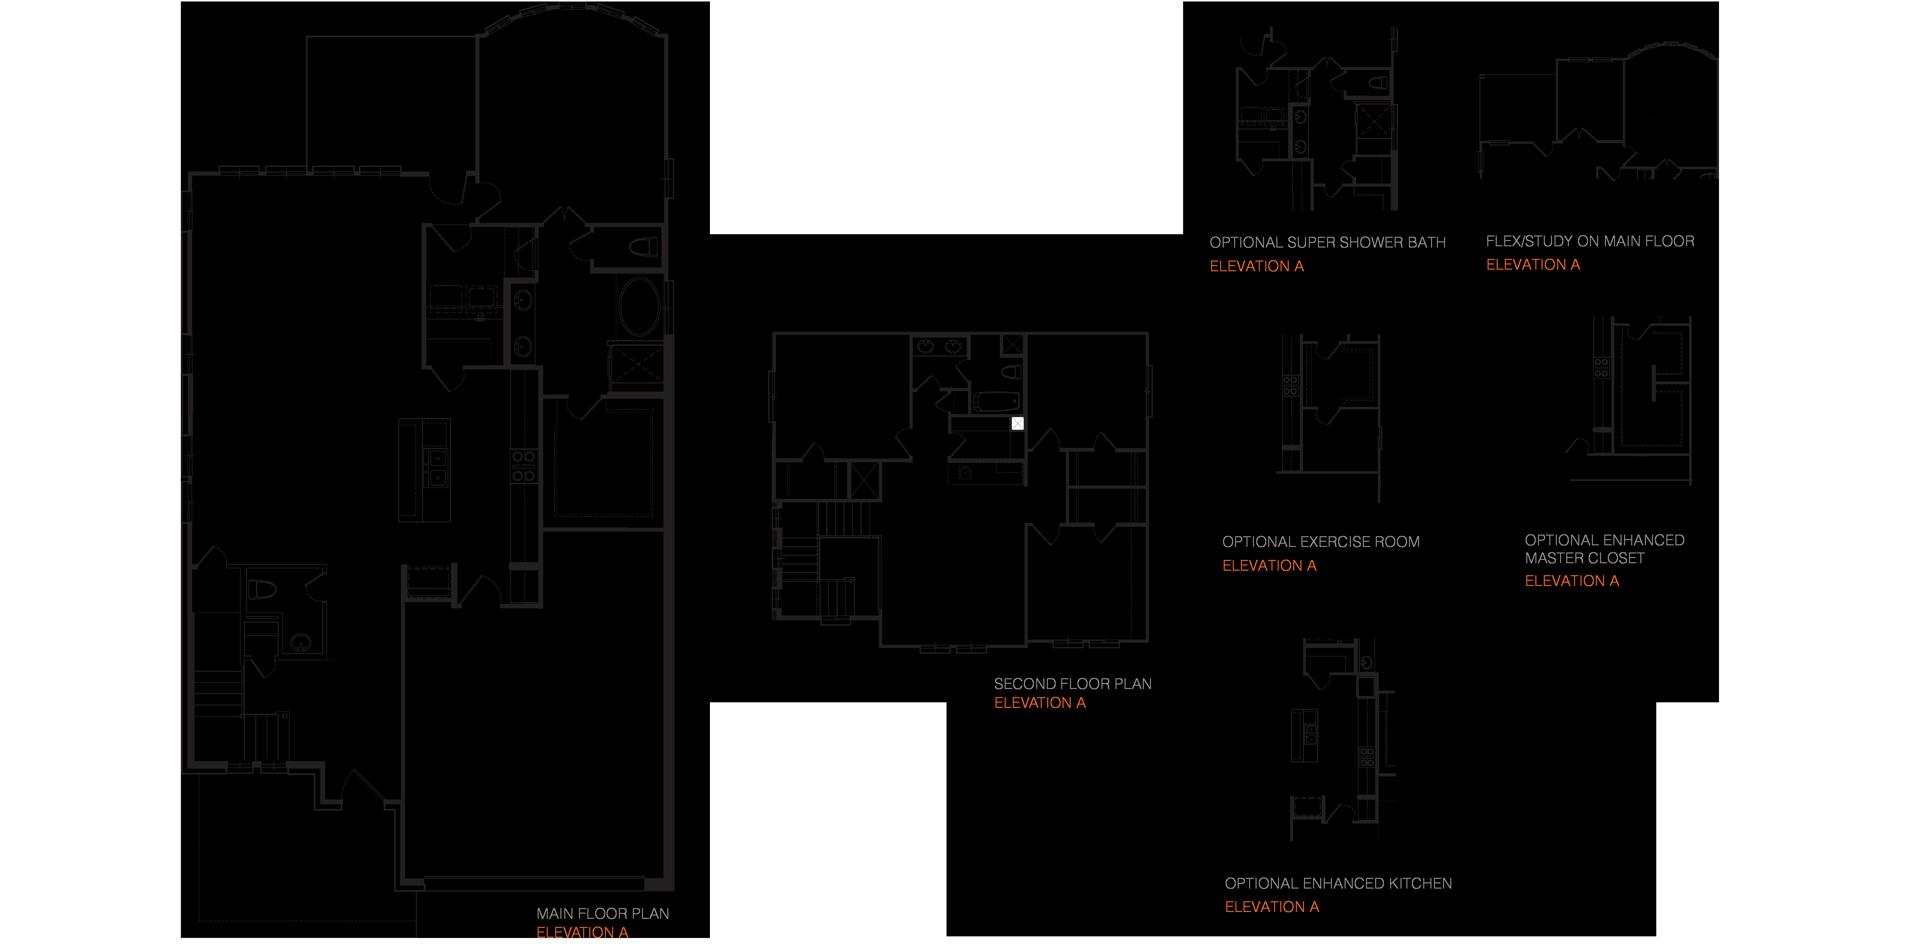 30287-Empire-Wellington-50-16A-Floor-Plan